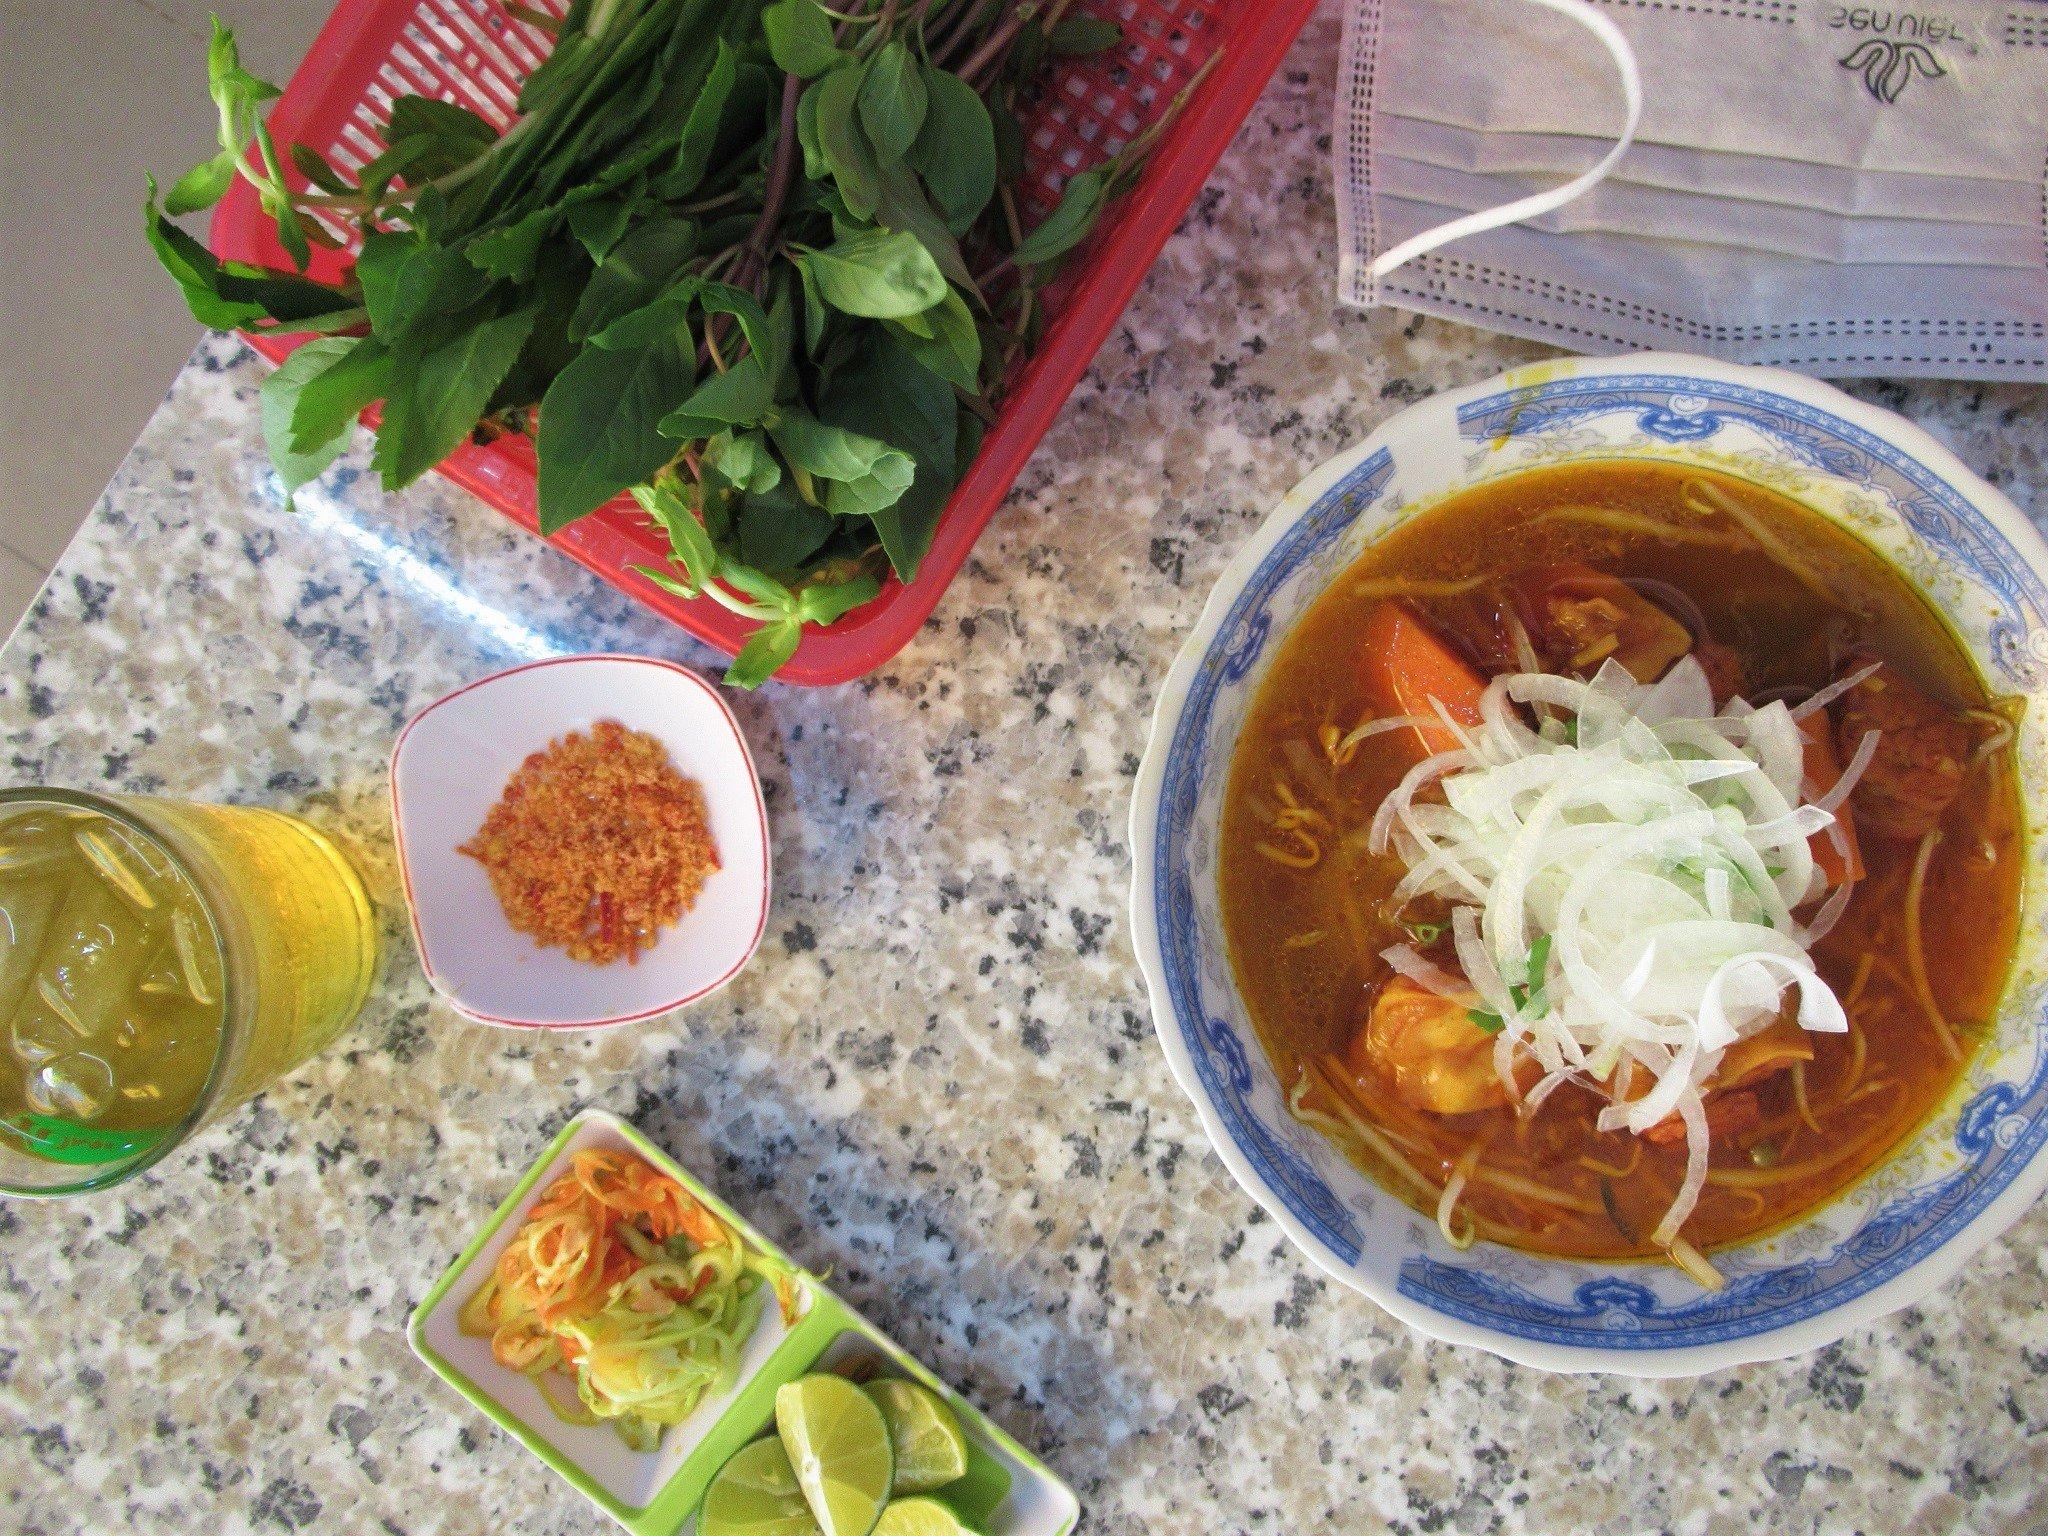 The local diet is healthy in Vung Tau, Vietnam